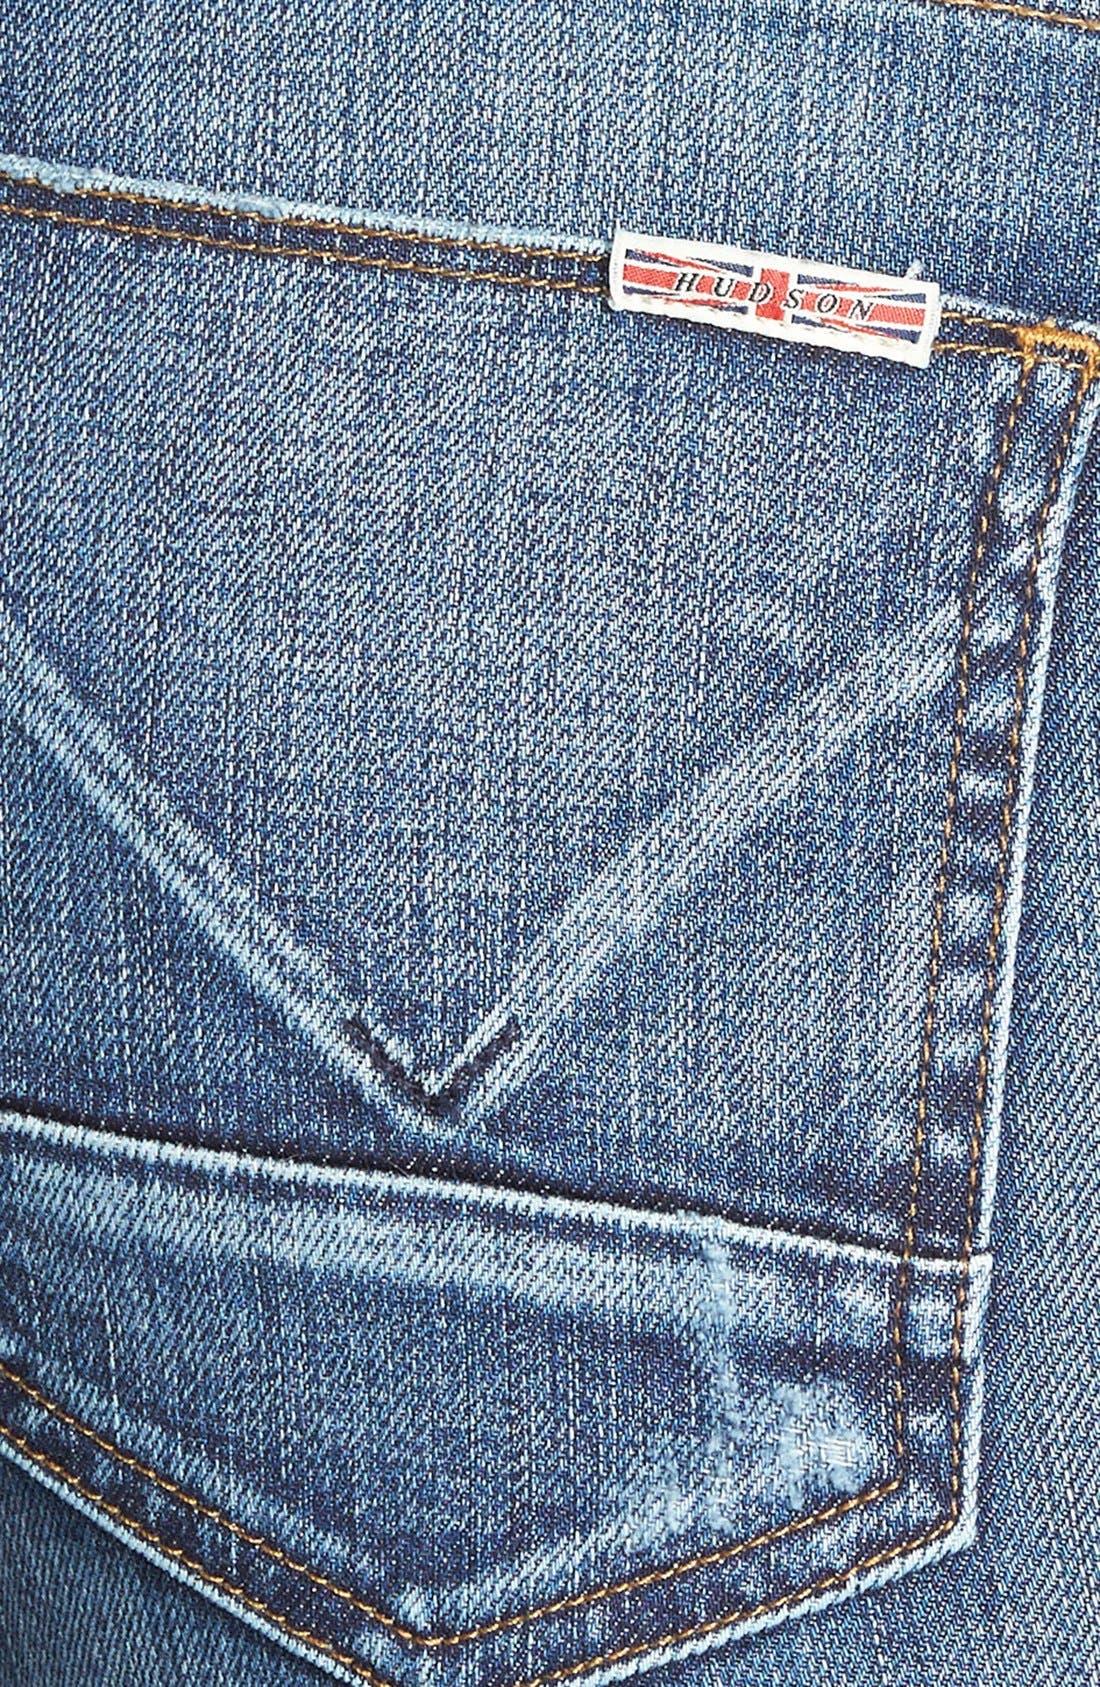 'Mia' Mid Rise Flare Jeans,                             Alternate thumbnail 2, color,                             423